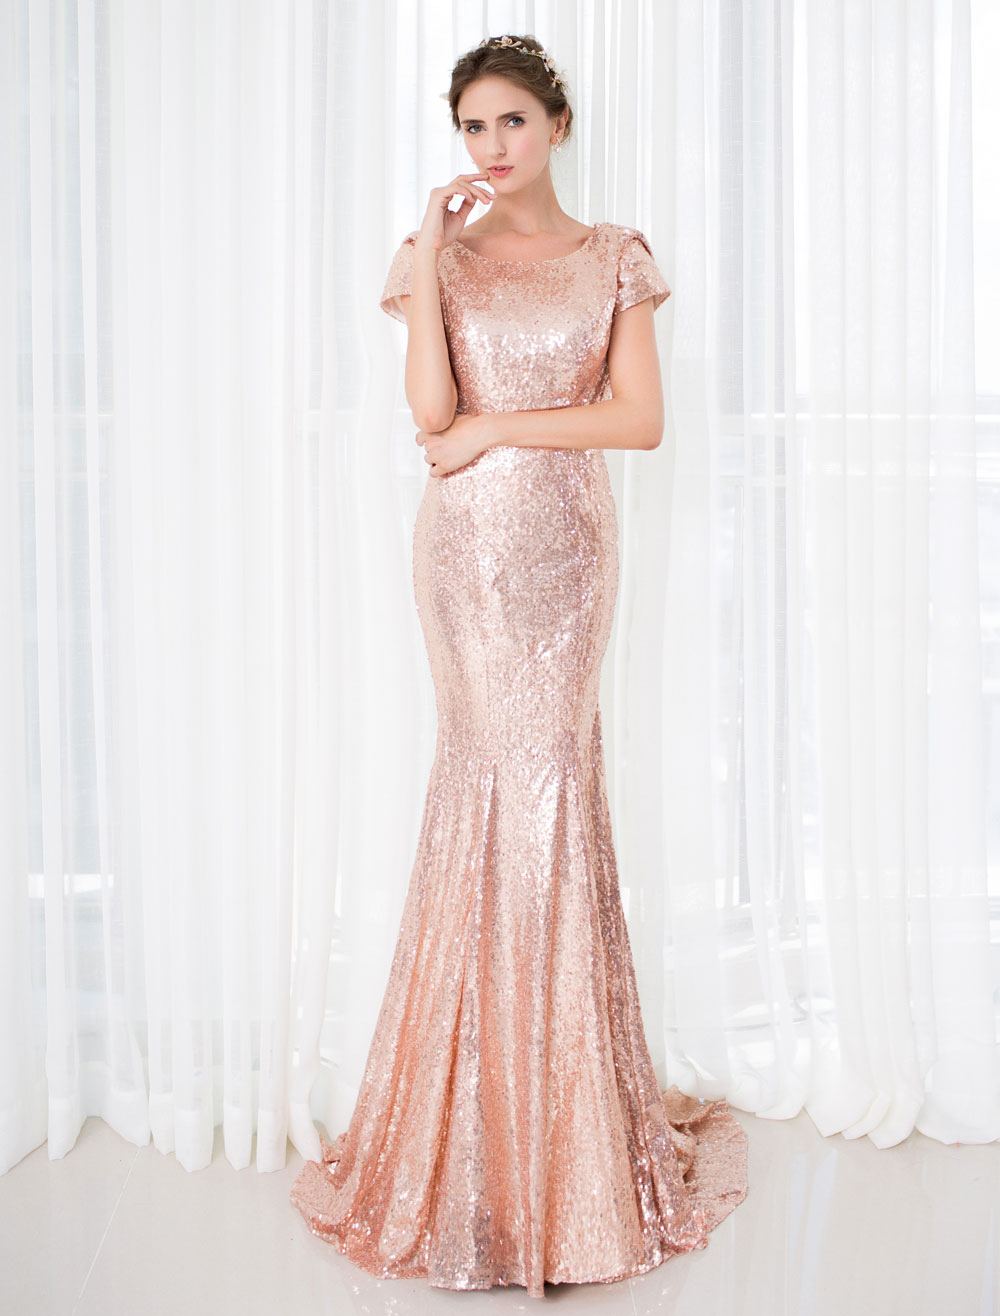 b7cdadf9b6911 Rose Gold Prom Dresses 2019 Long Nude Mermaid Backless Evening Dress Sequin  Court Train Short Sleeve Red Carpet Dress wedding guest dress - Milanoo.com